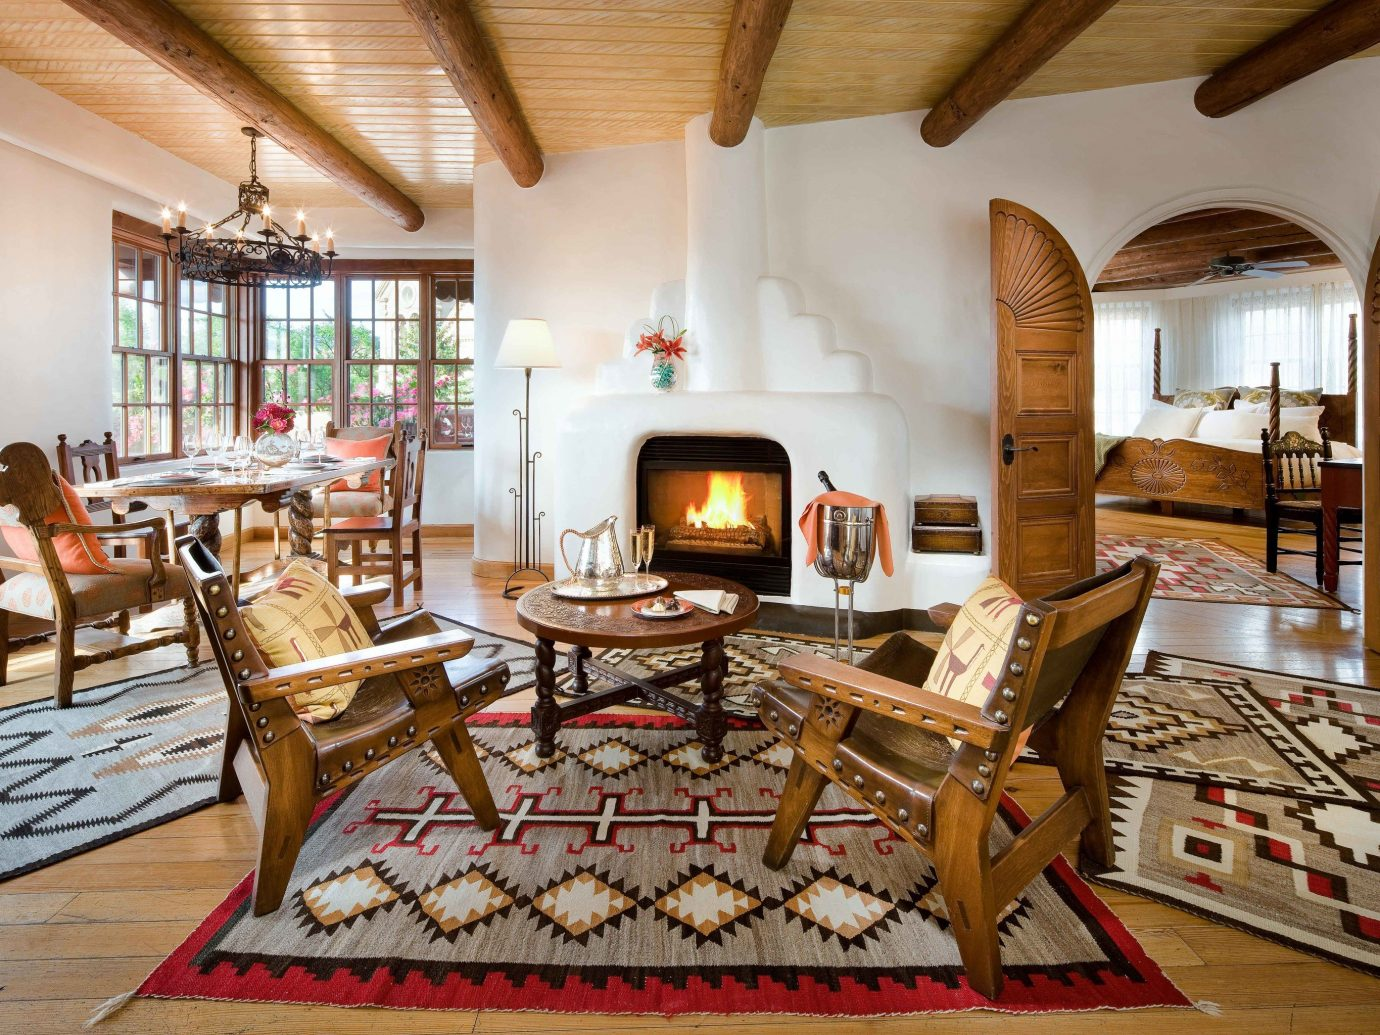 indoor floor room table Living living room interior design flooring wood real estate estate furniture hardwood